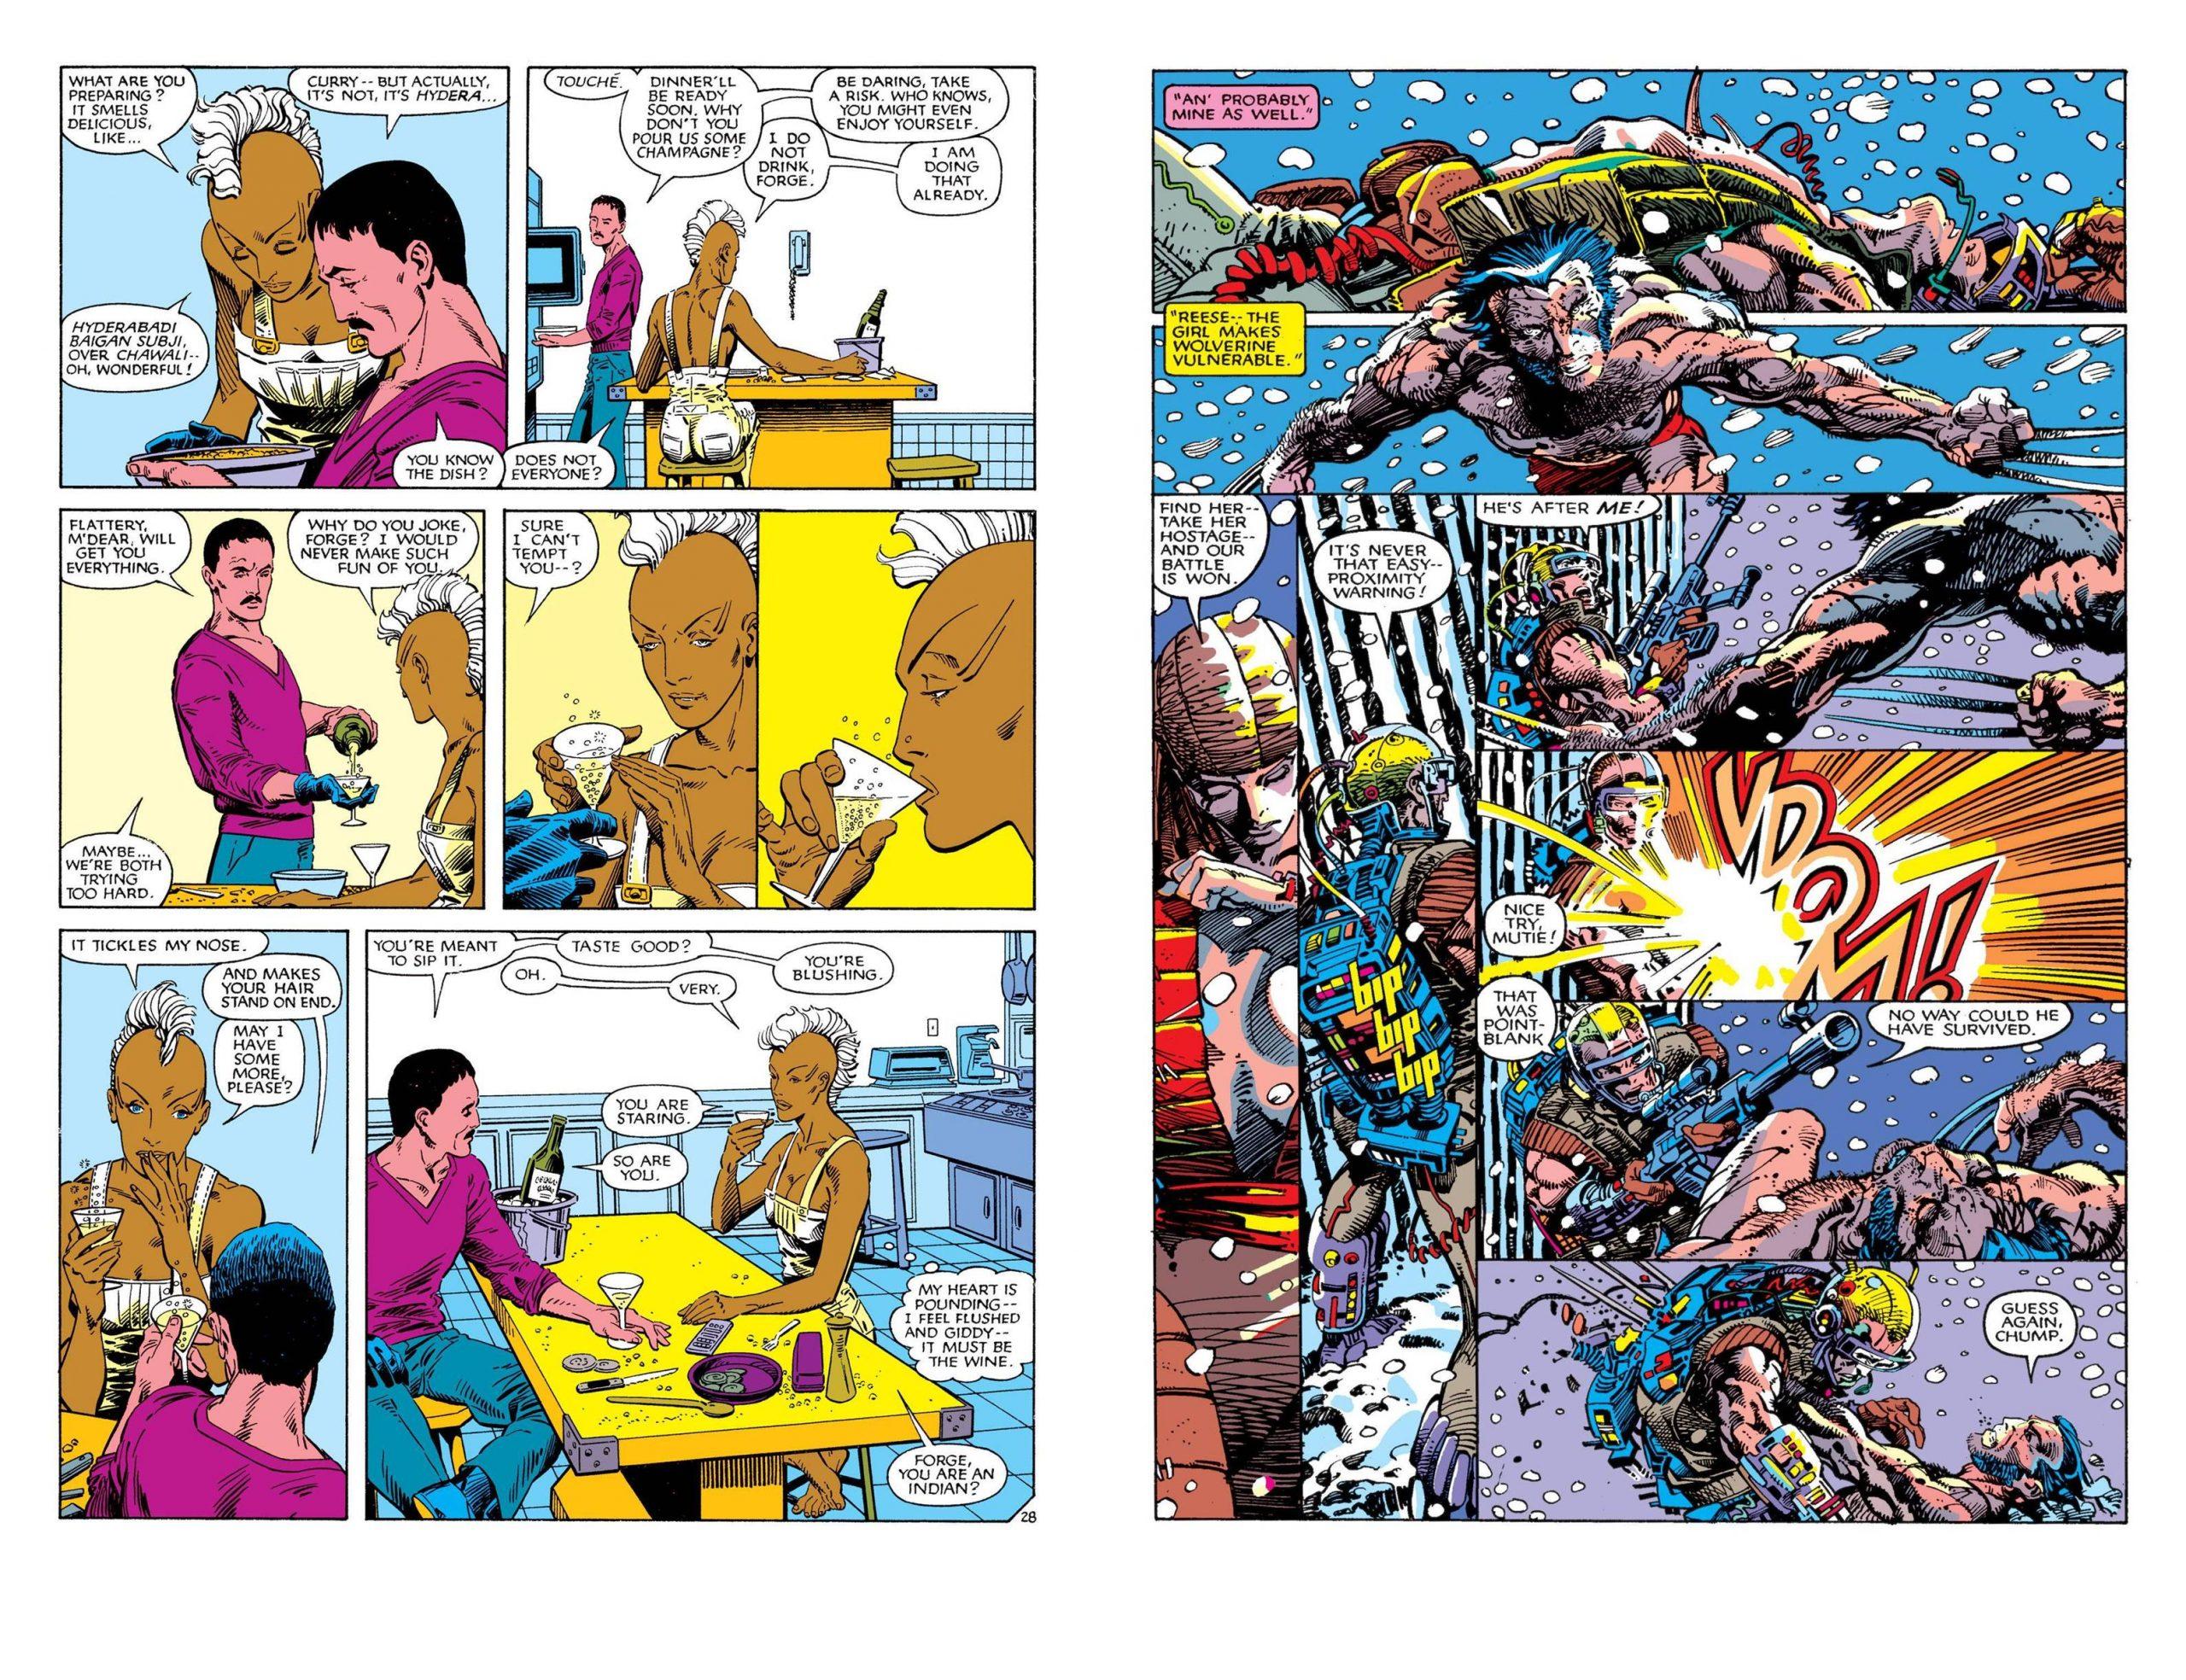 X-Men - Lifedeath review